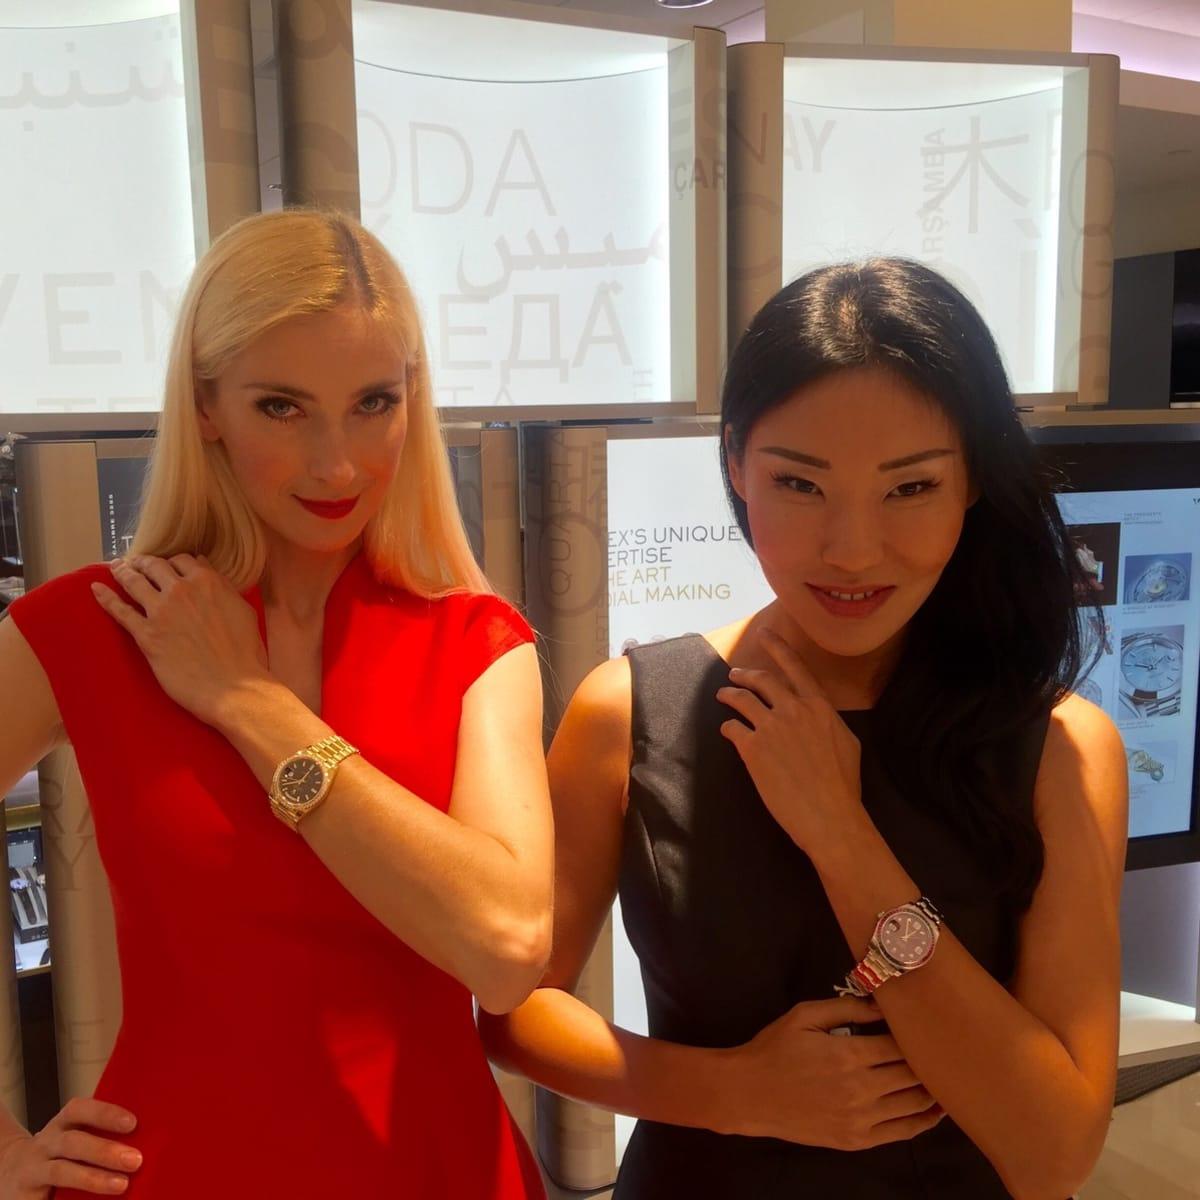 News, IW Marks Rolex Event, Dec. 2015, models